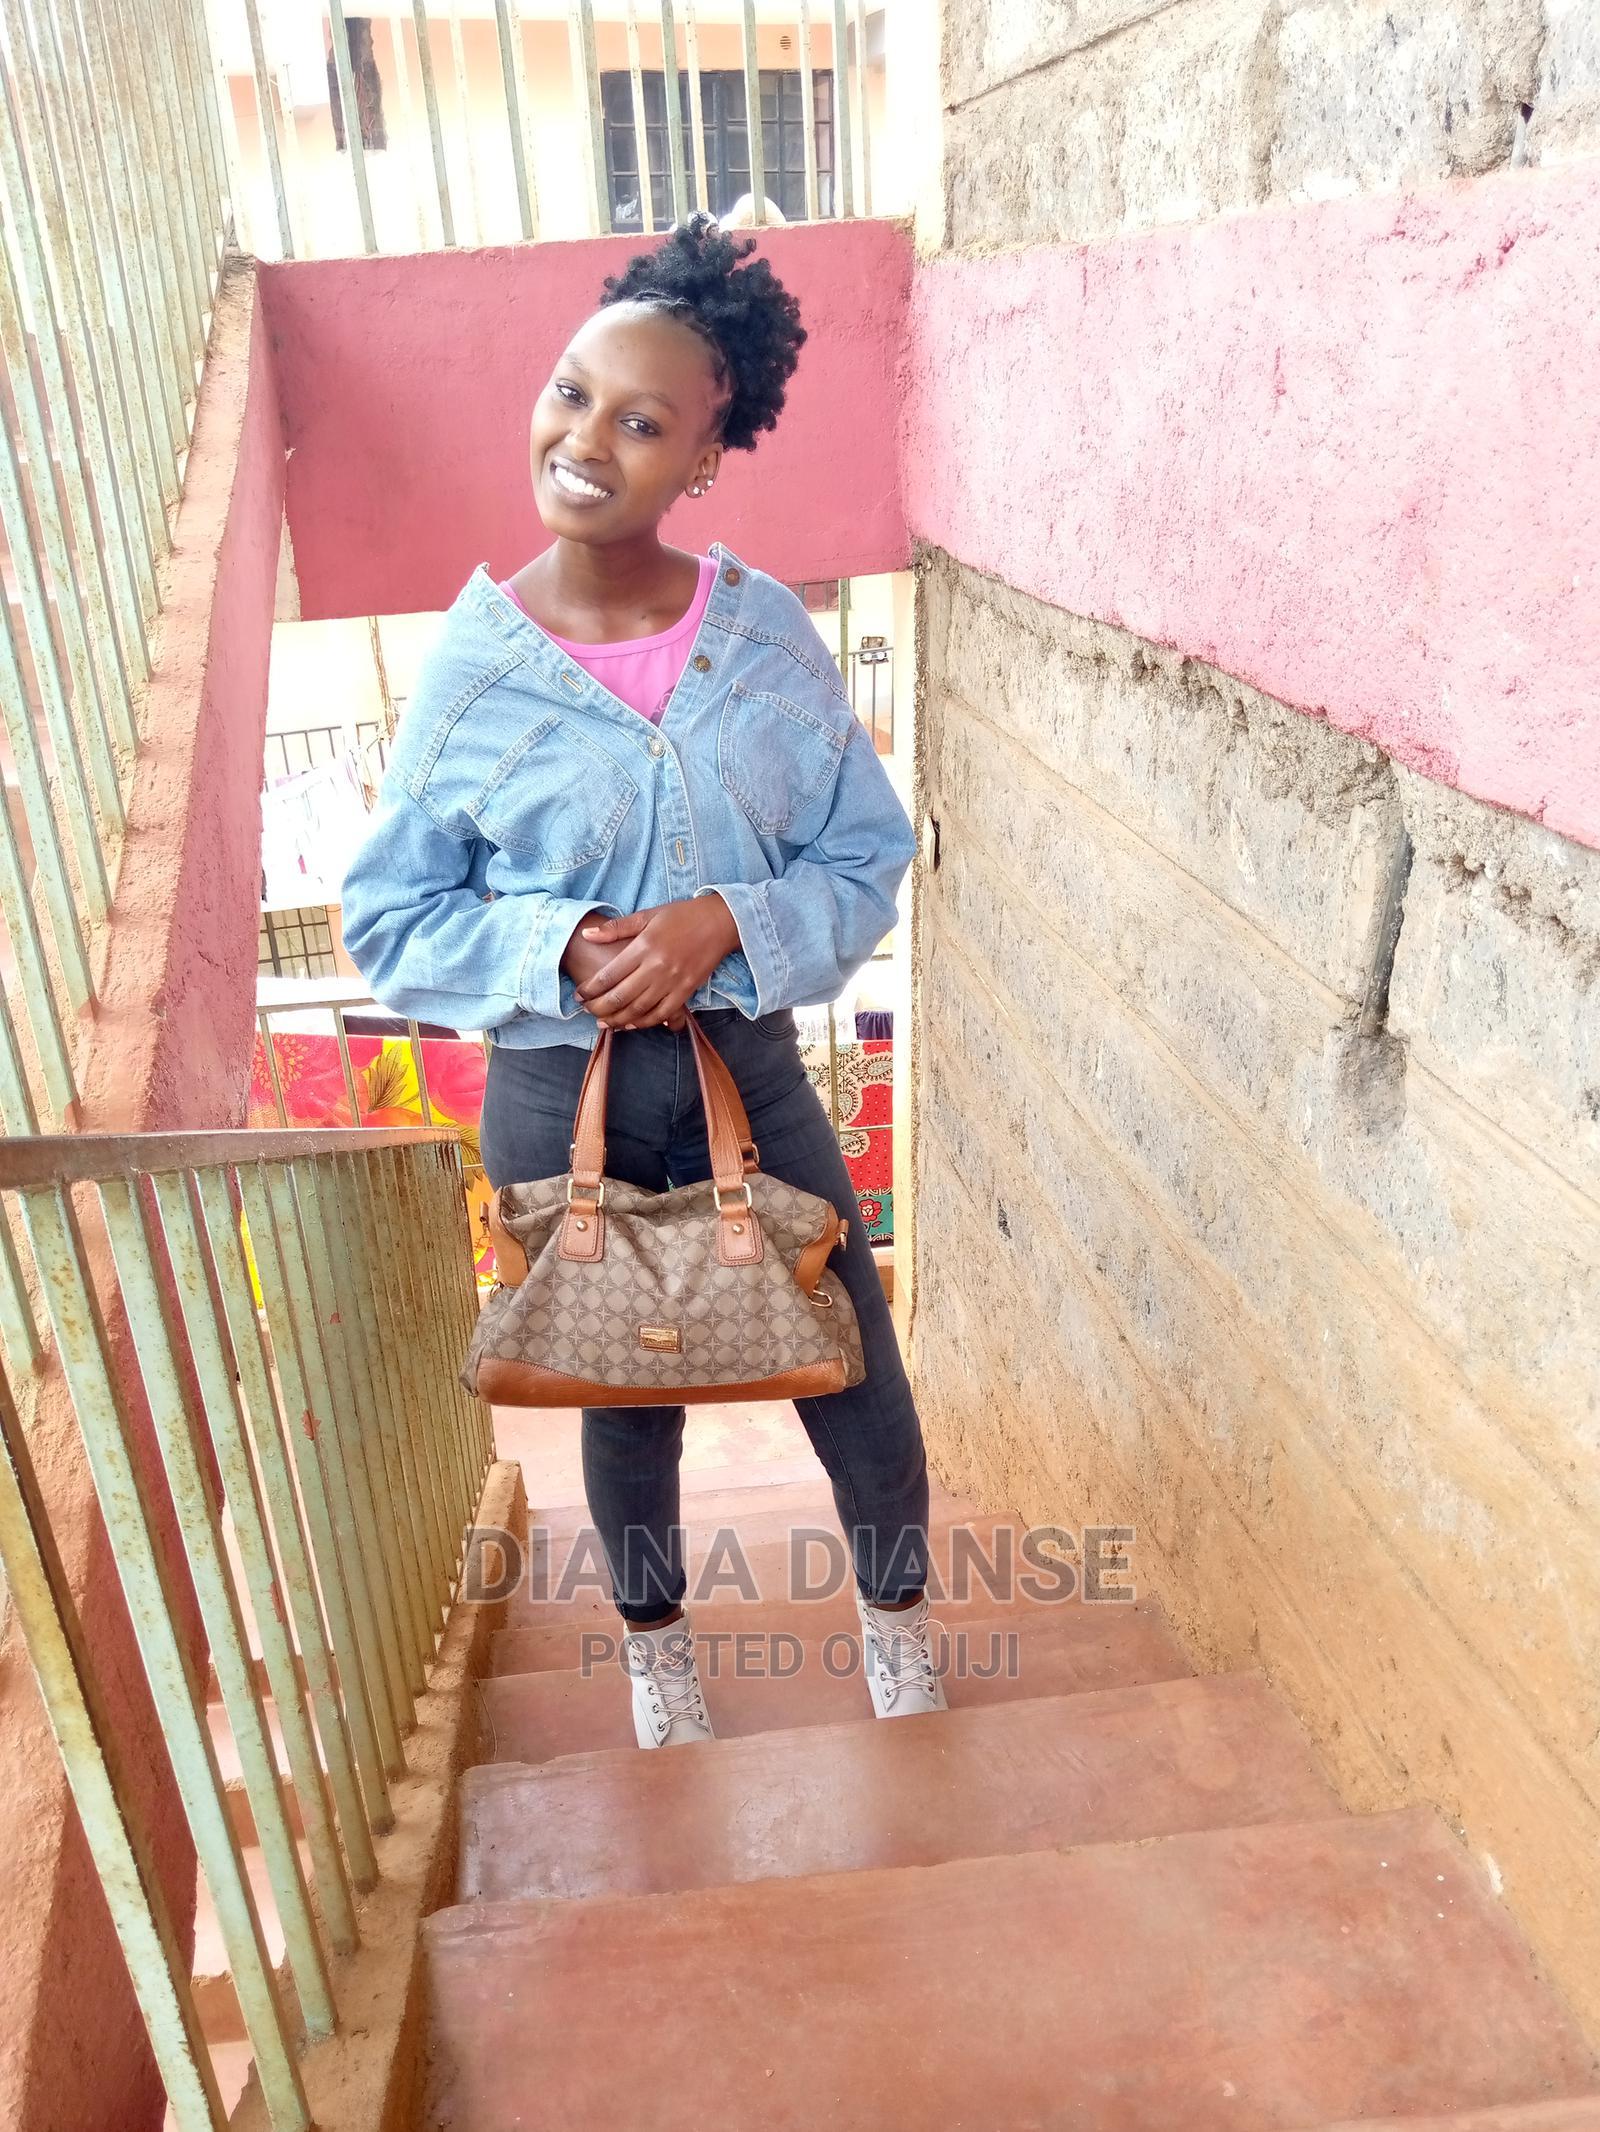 Customer Facing Shop Attendant | Retail CVs for sale in Banana, Kiambu, Kenya